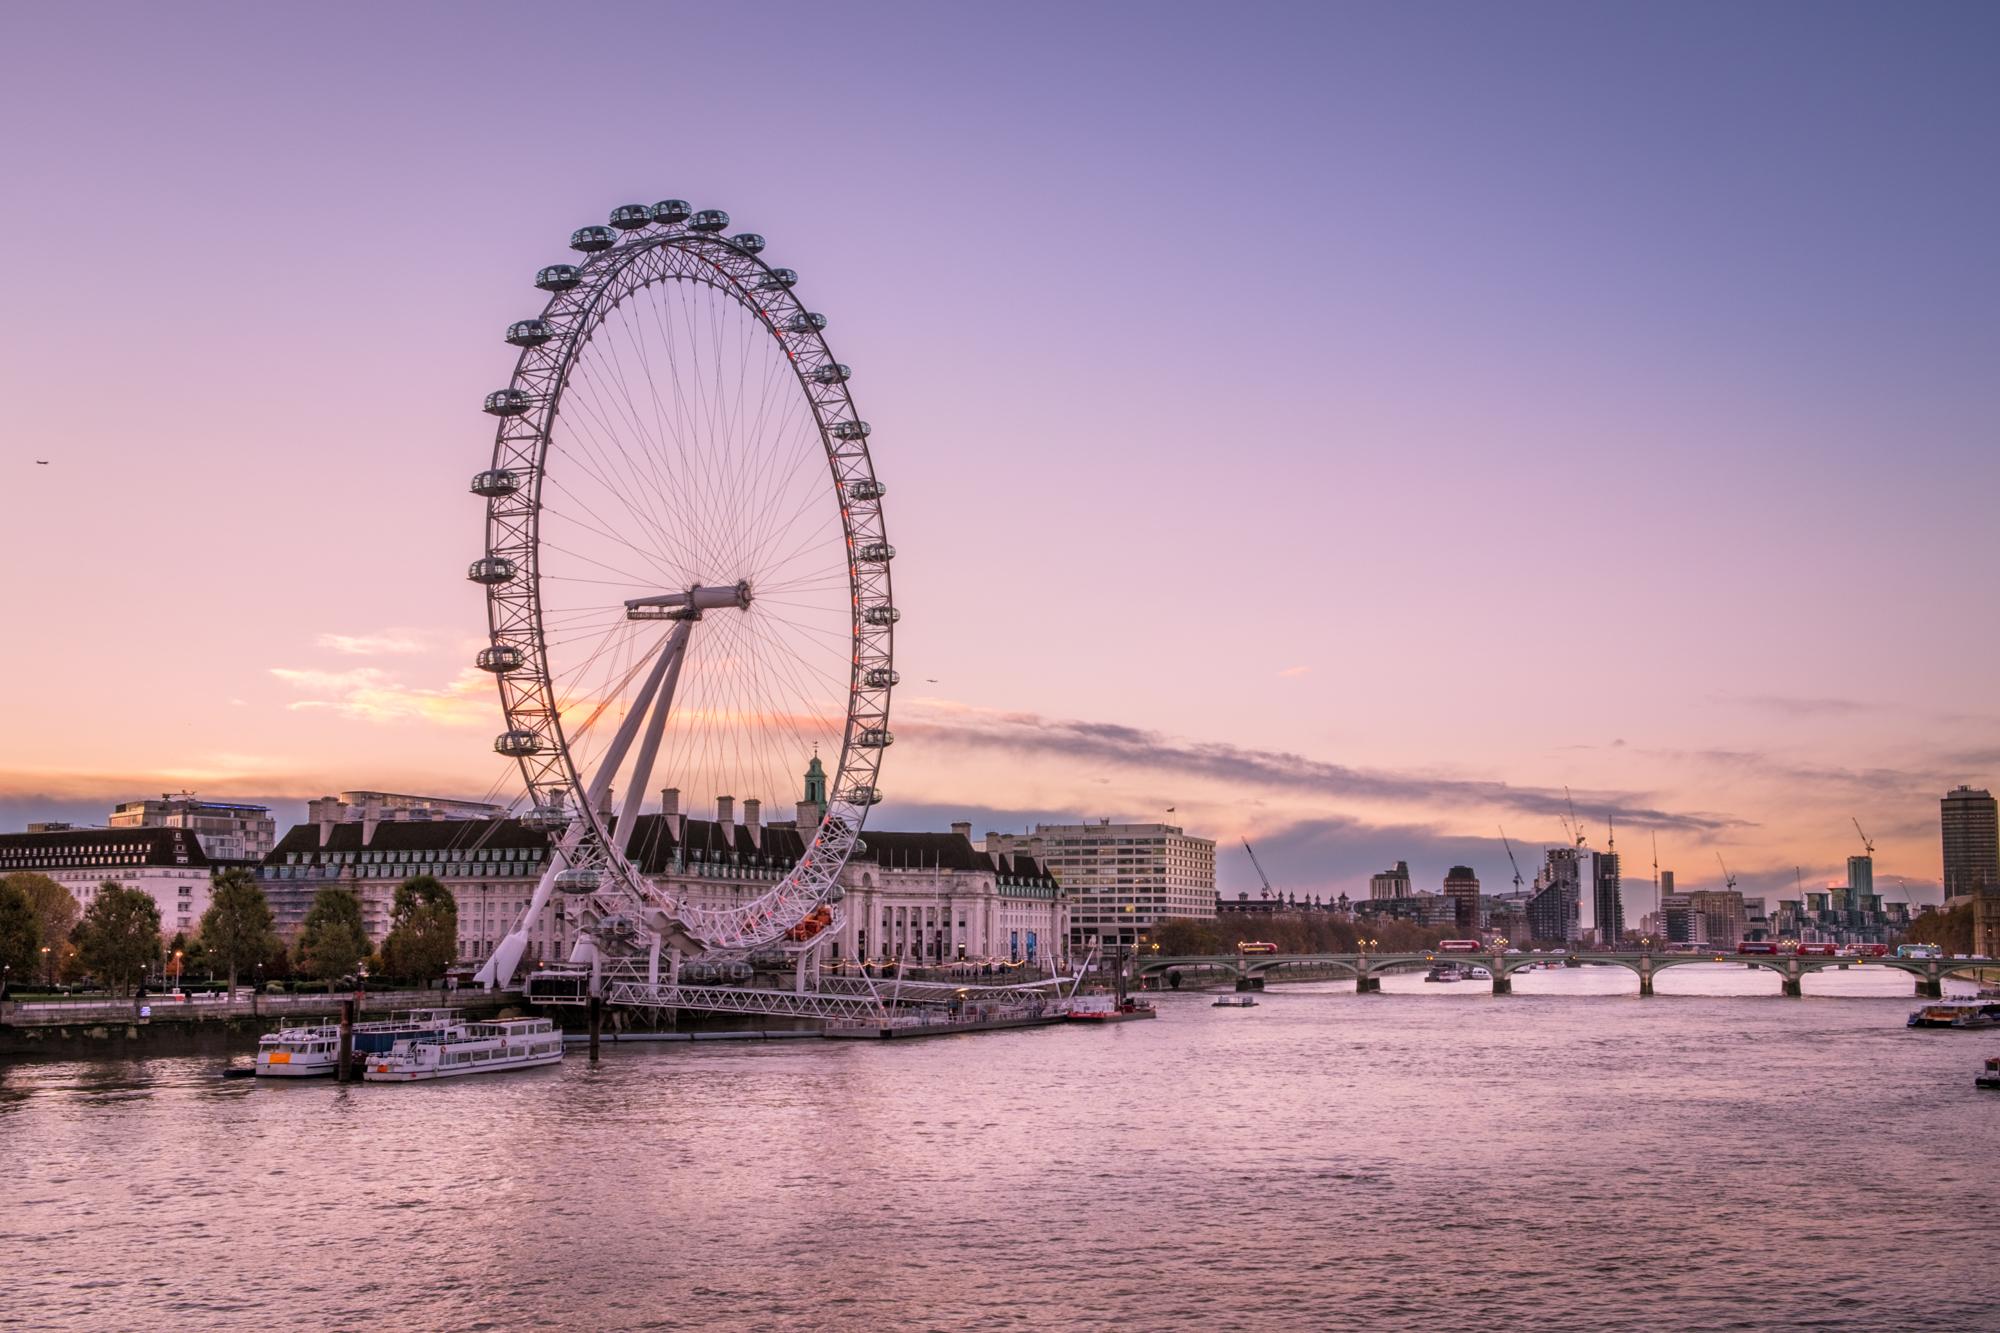 Photo of the London Eye taken by Trevor Sherwin